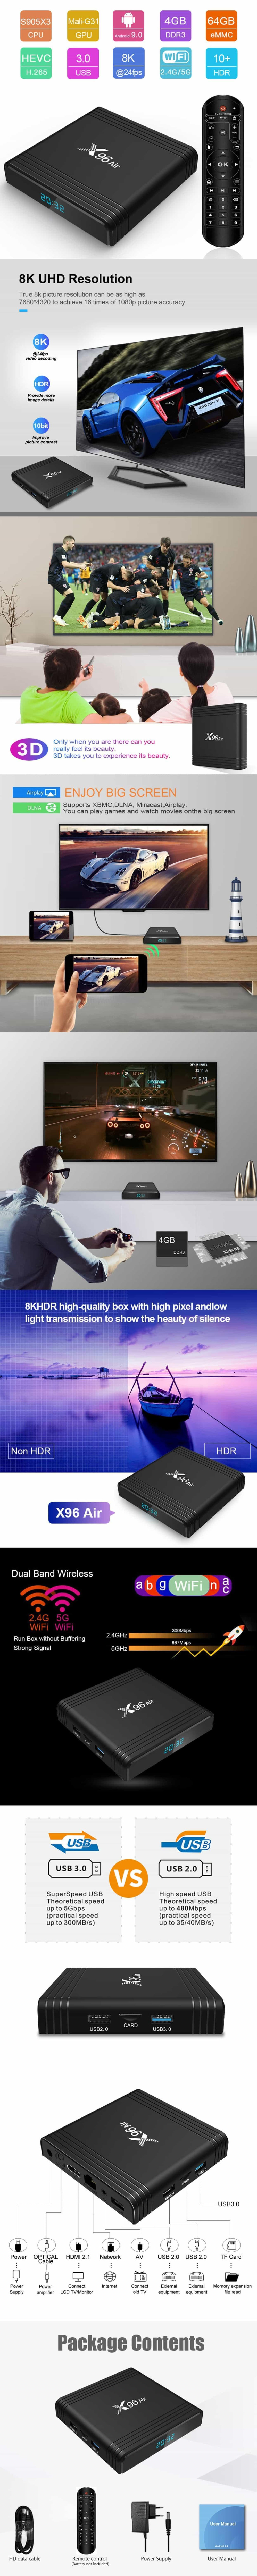 Prezentare-TV-Box-X96-Air4043a3bd22f479b5.jpg